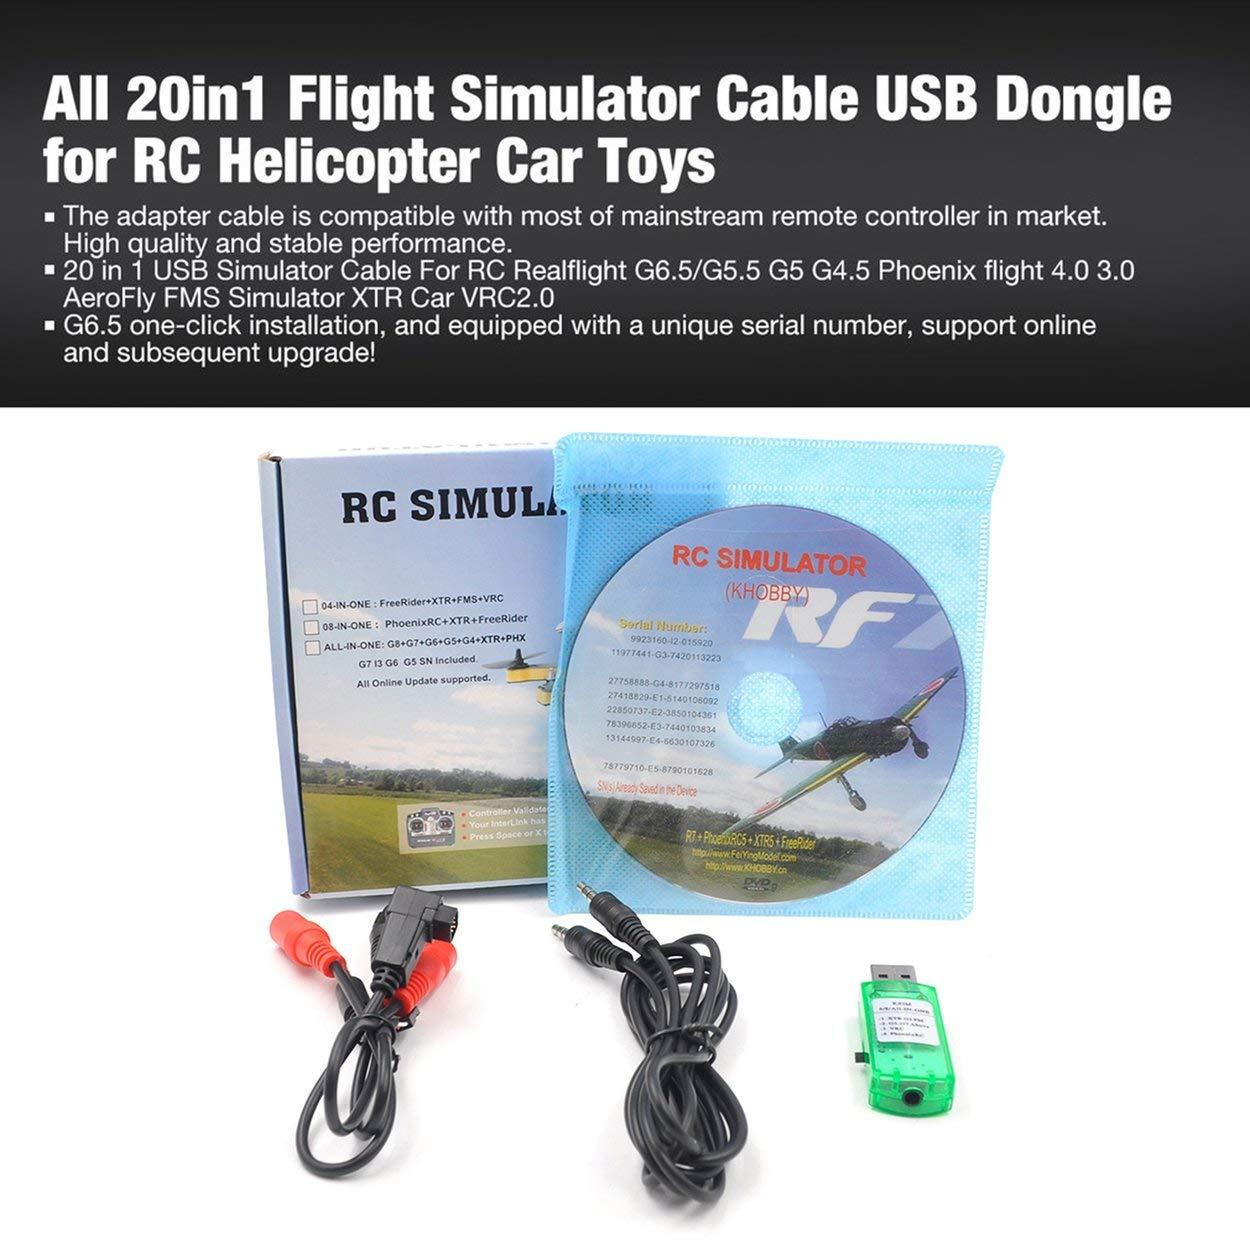 Lorenlli RC Simulador Cable Inal/ámbrico 20In1 Simulador de Vuelo Cable USB Dongle para RC Helic/óptero Juguetes de Coche de Avi/ón